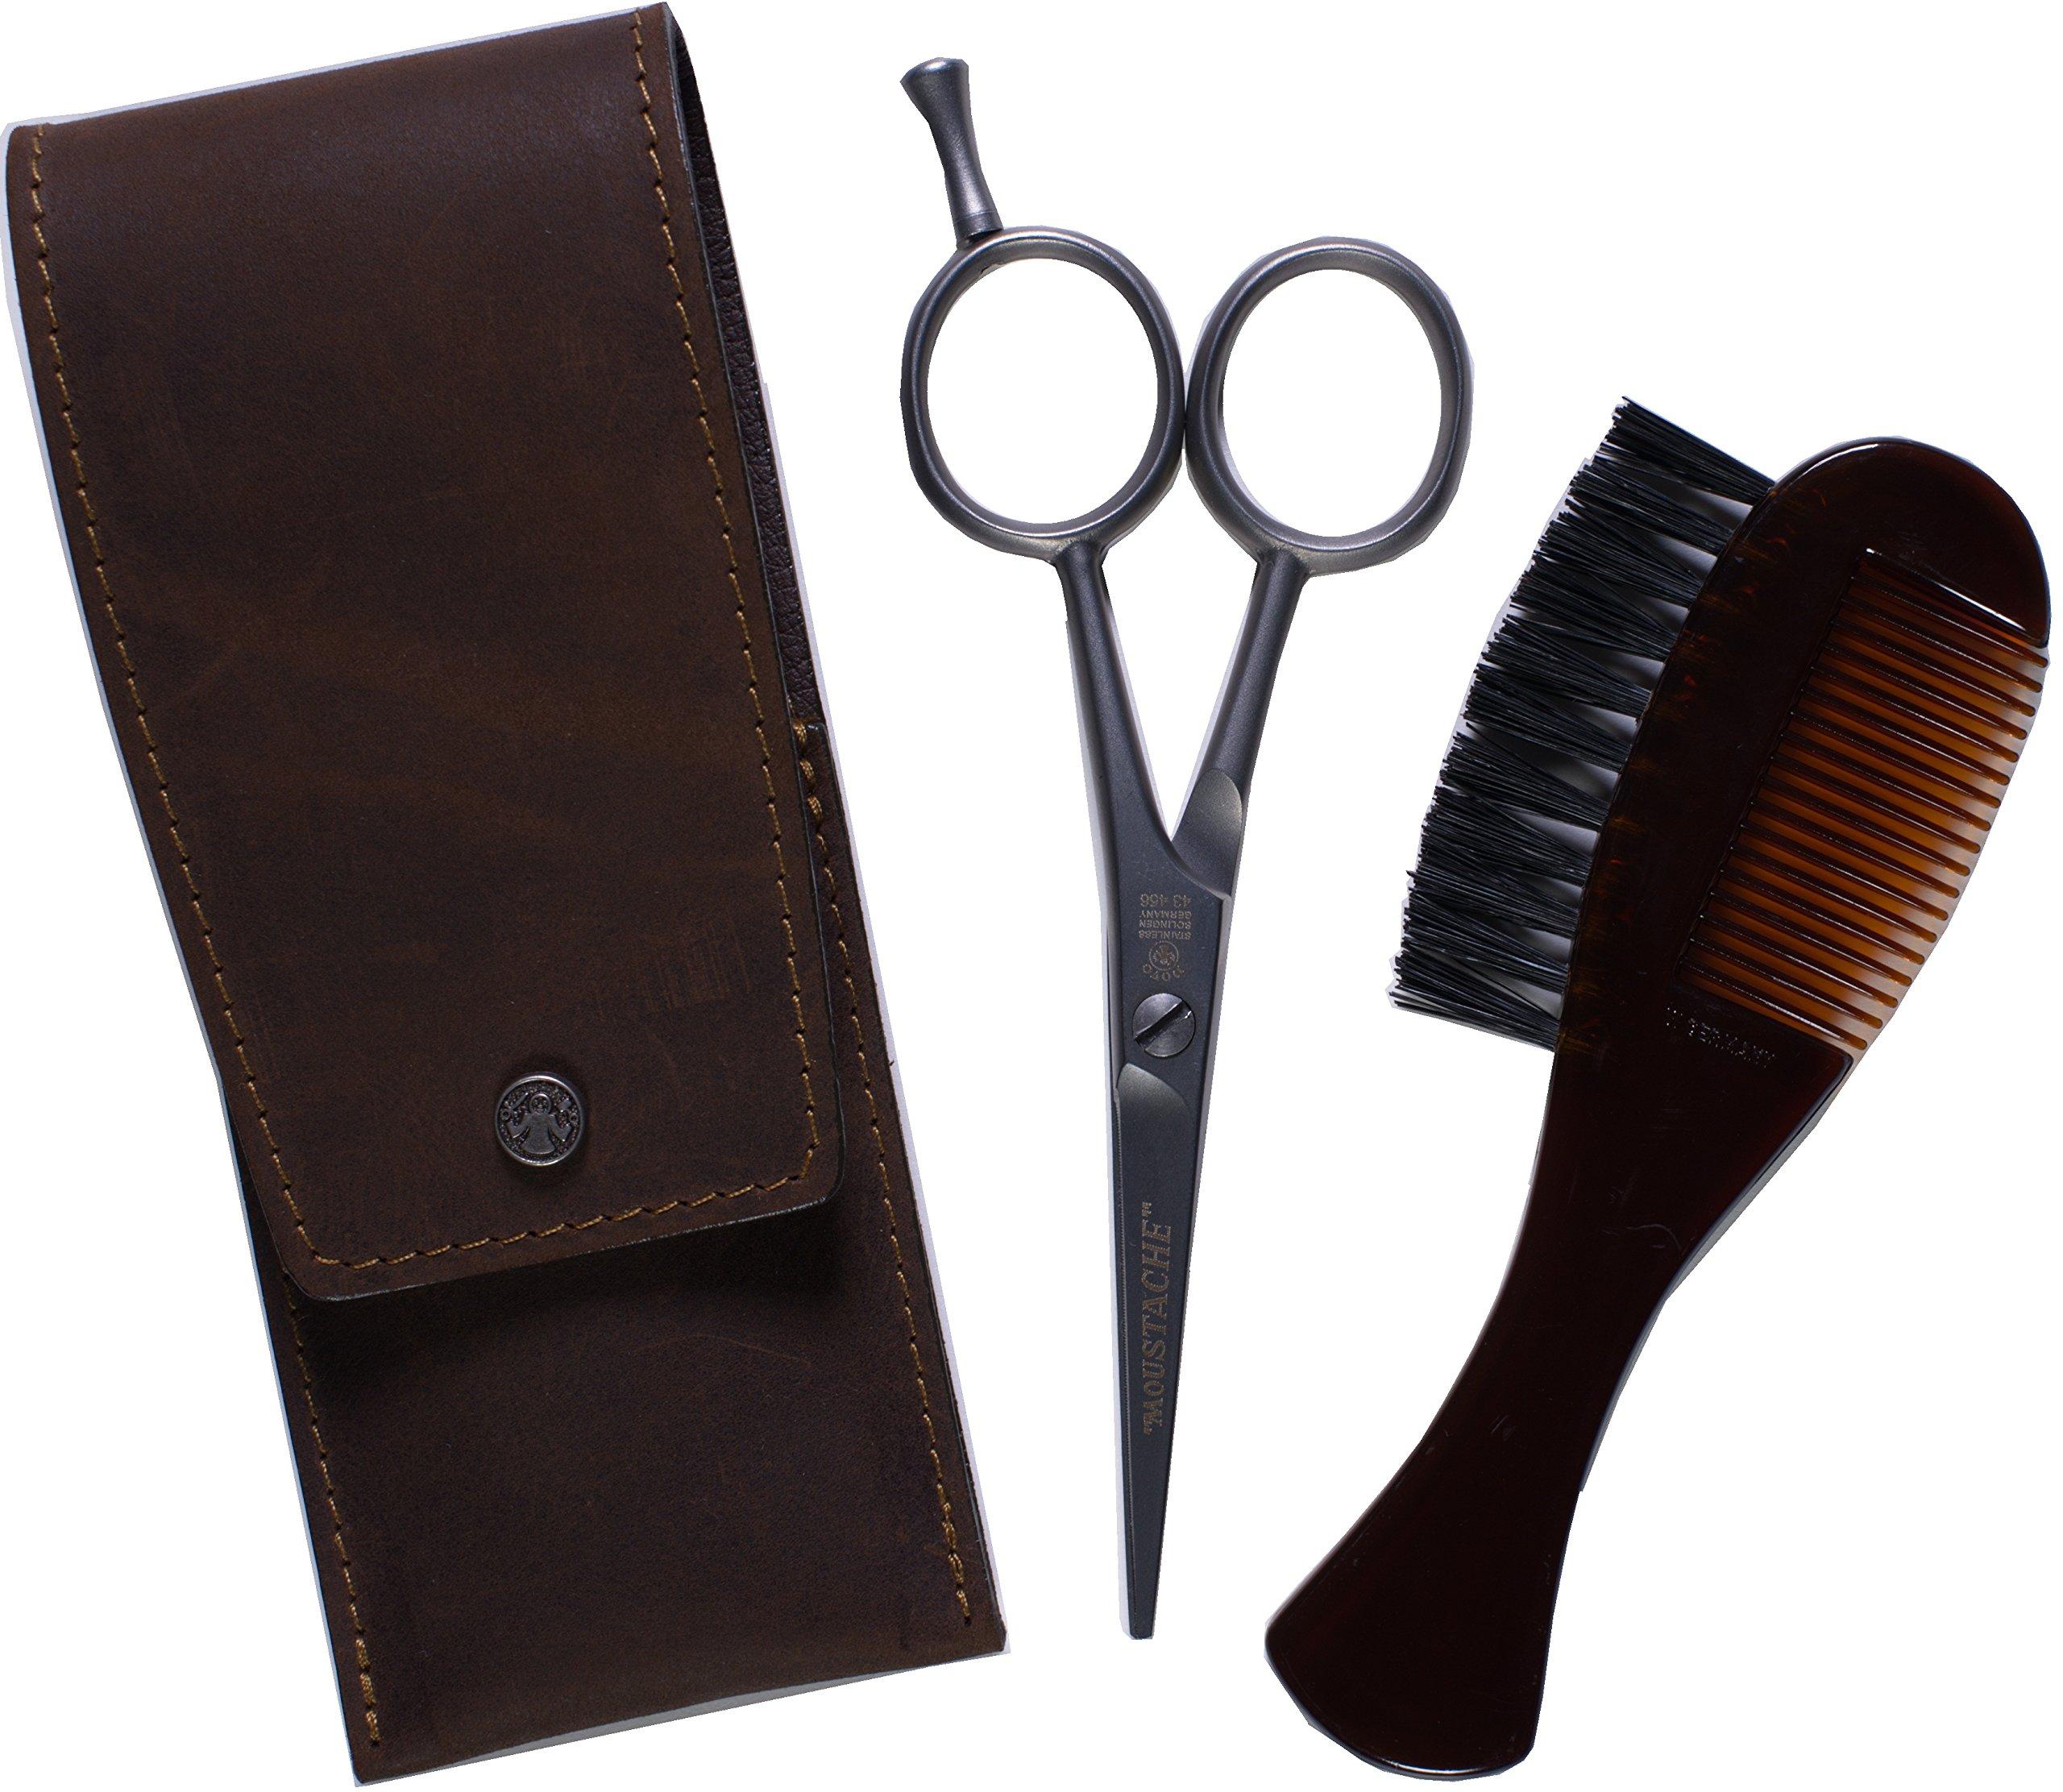 Dovo Beard and Moustache Scissor Set - Comb/Brush, Custom Case, Stainless Steel 4.5-Inch Scissor, Made in Germany